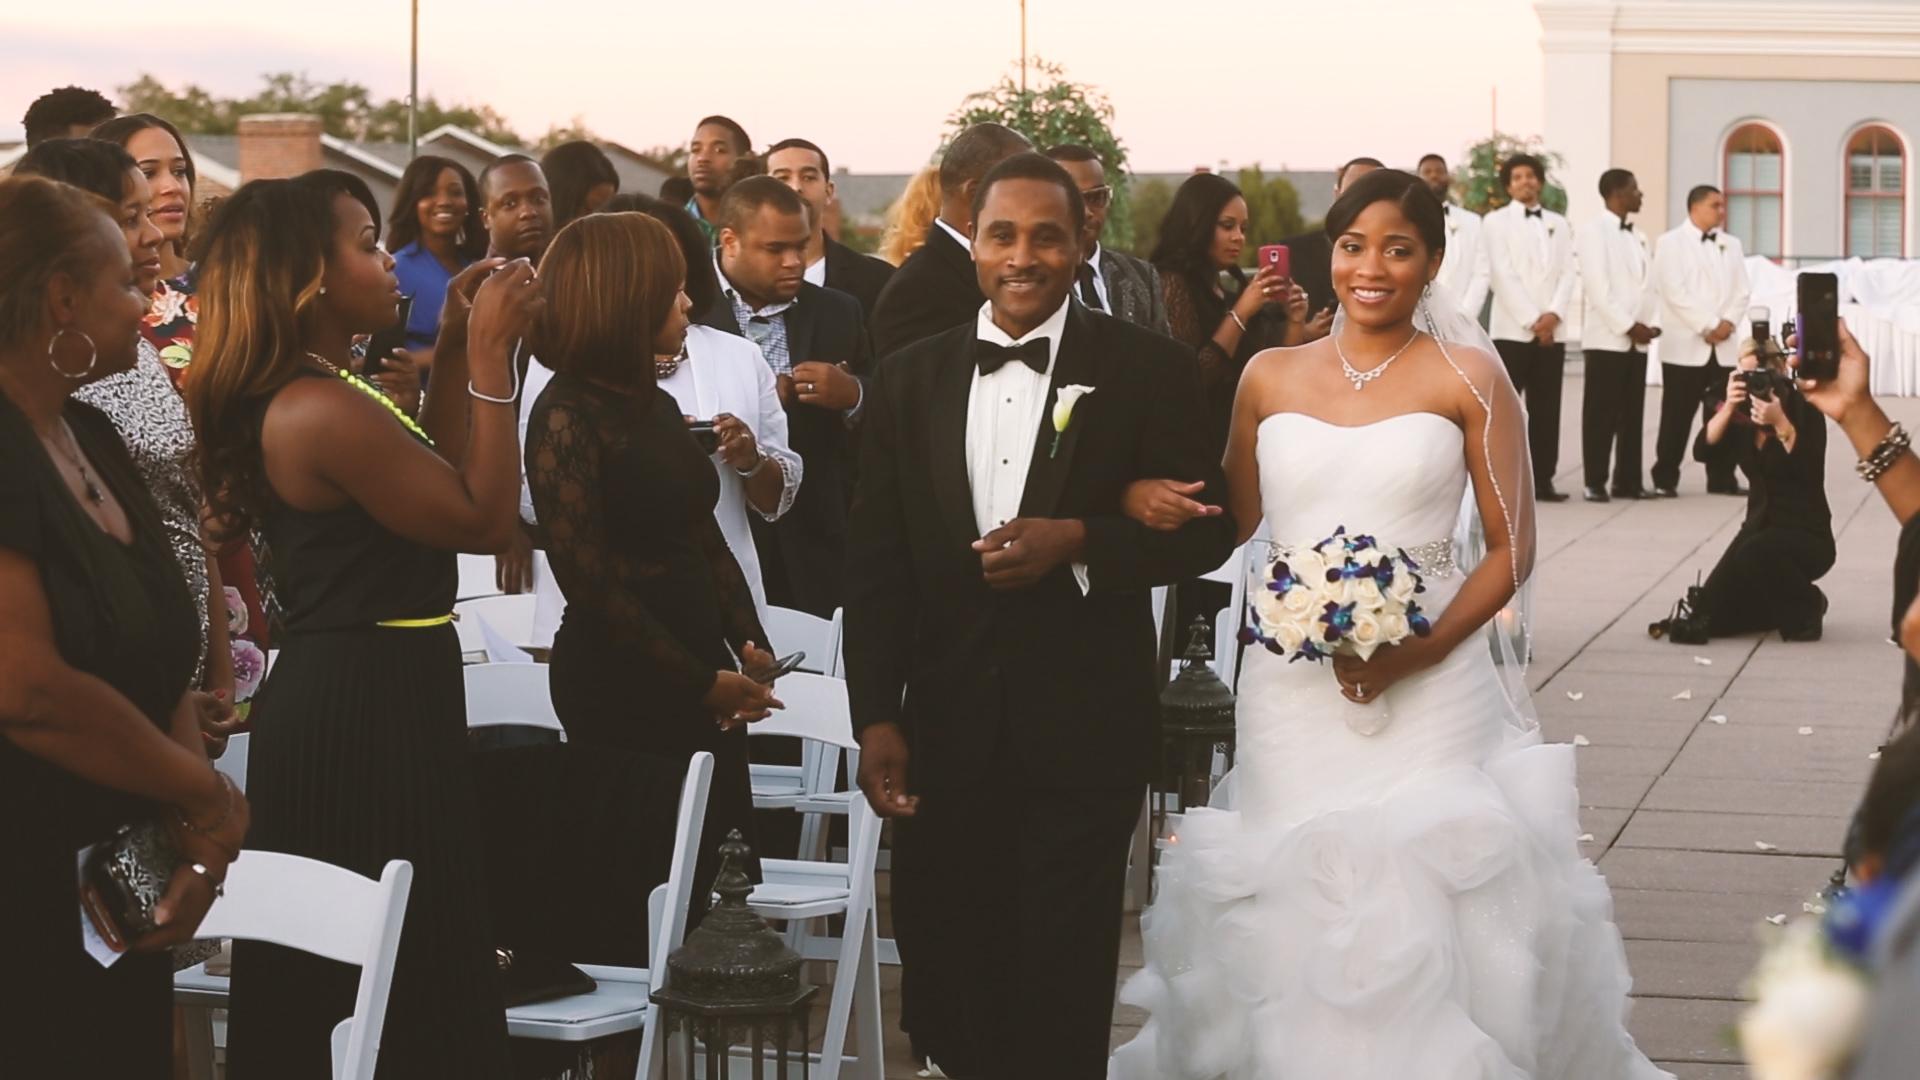 Bridal Walk - Bride Film